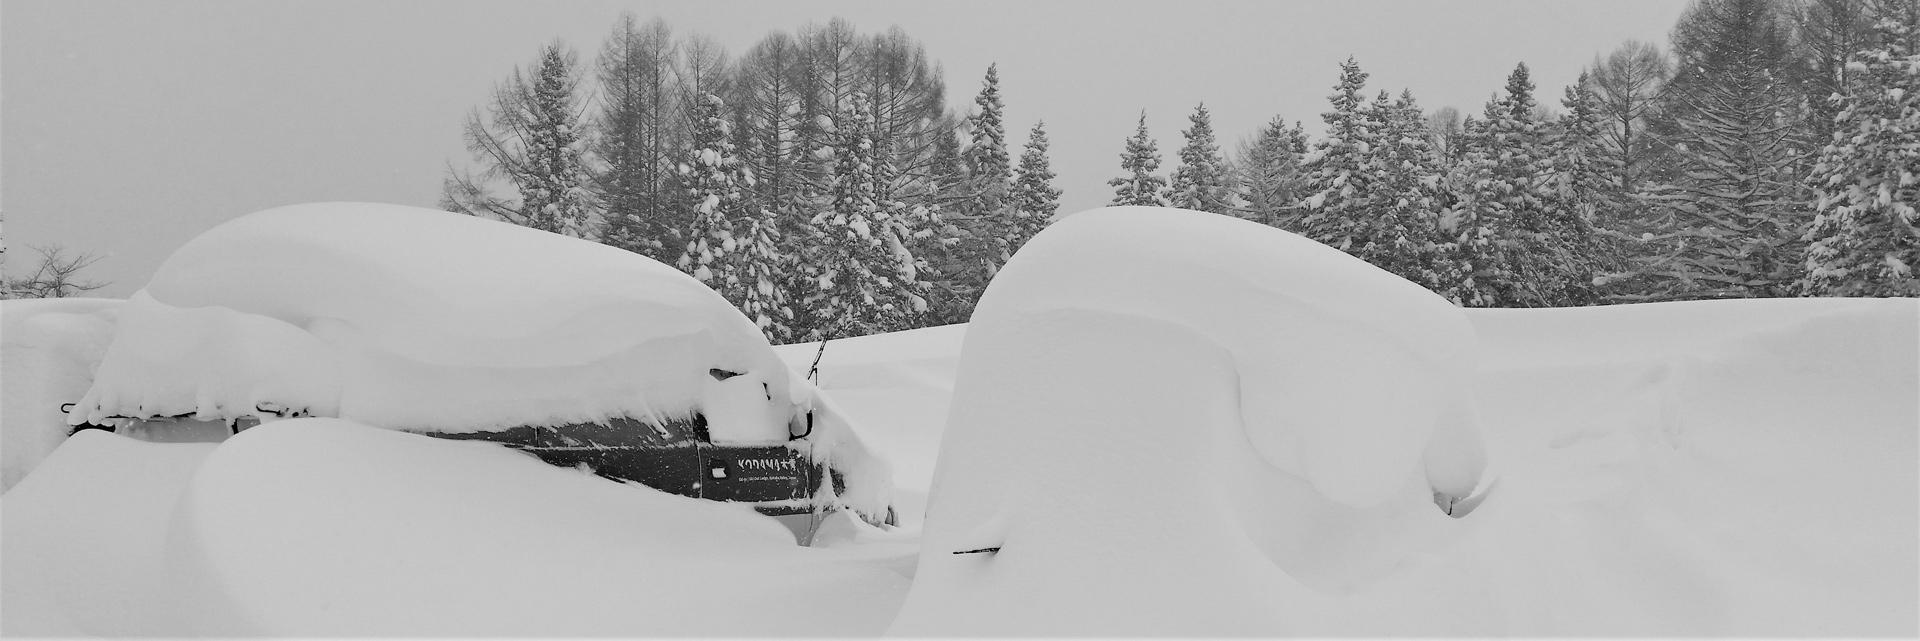 Contact - Kodama Lodge - Japan - Ski & Snowboard